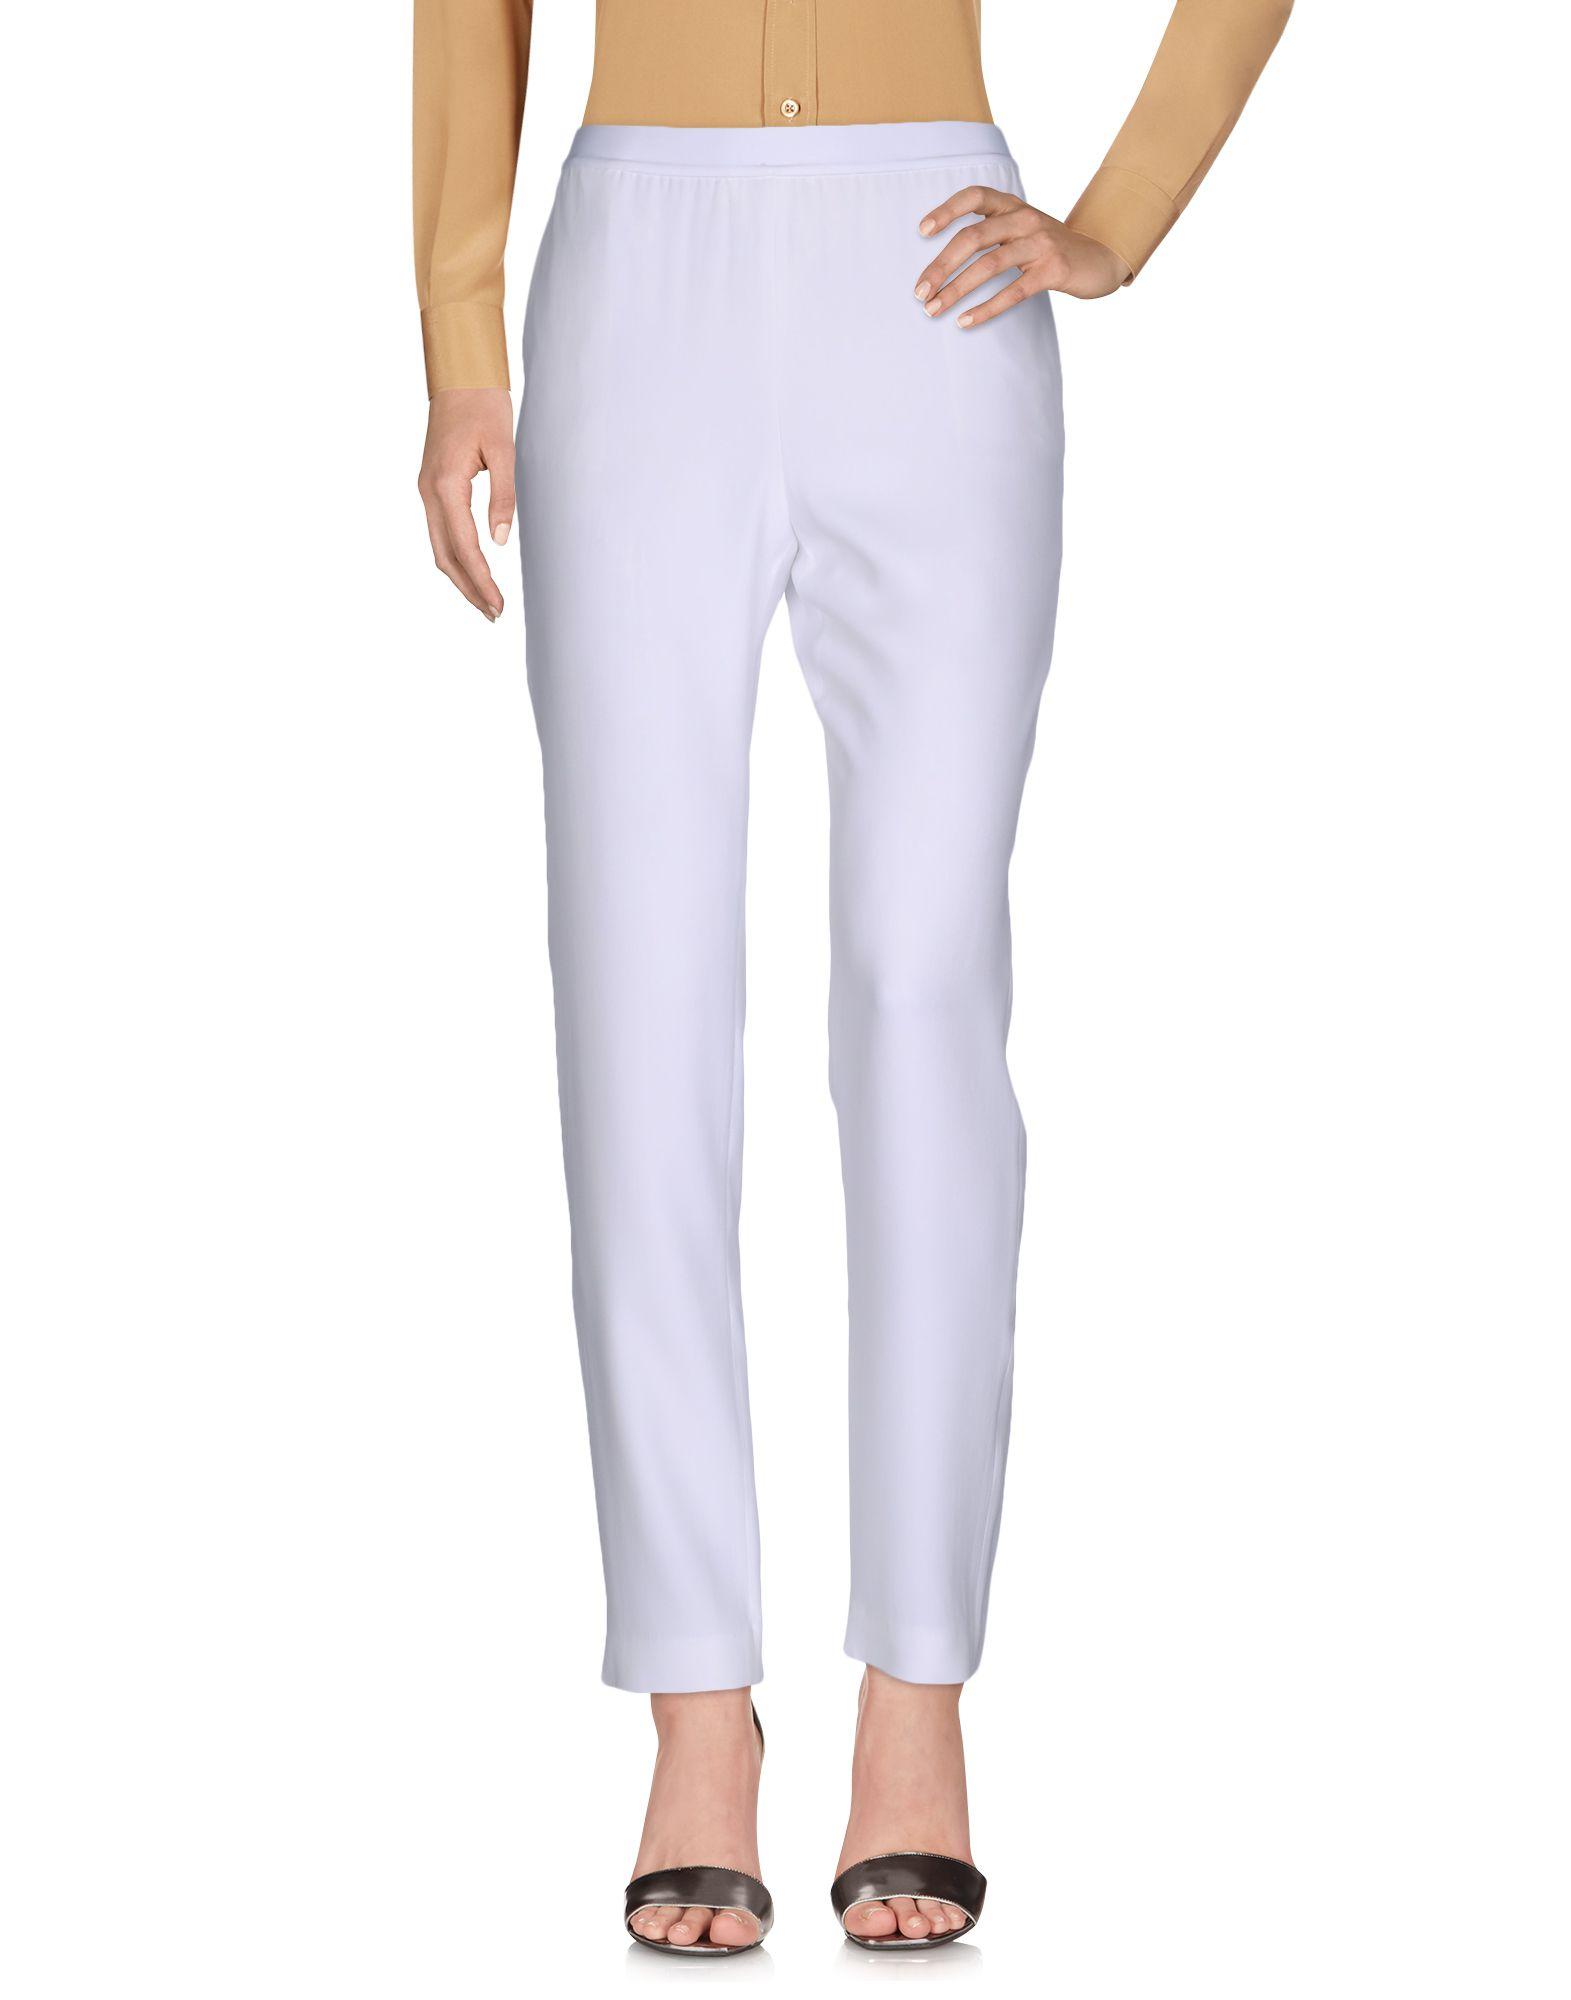 Pantalone Twisty Parallel Universe Donna - Acquista online su GKKnhf